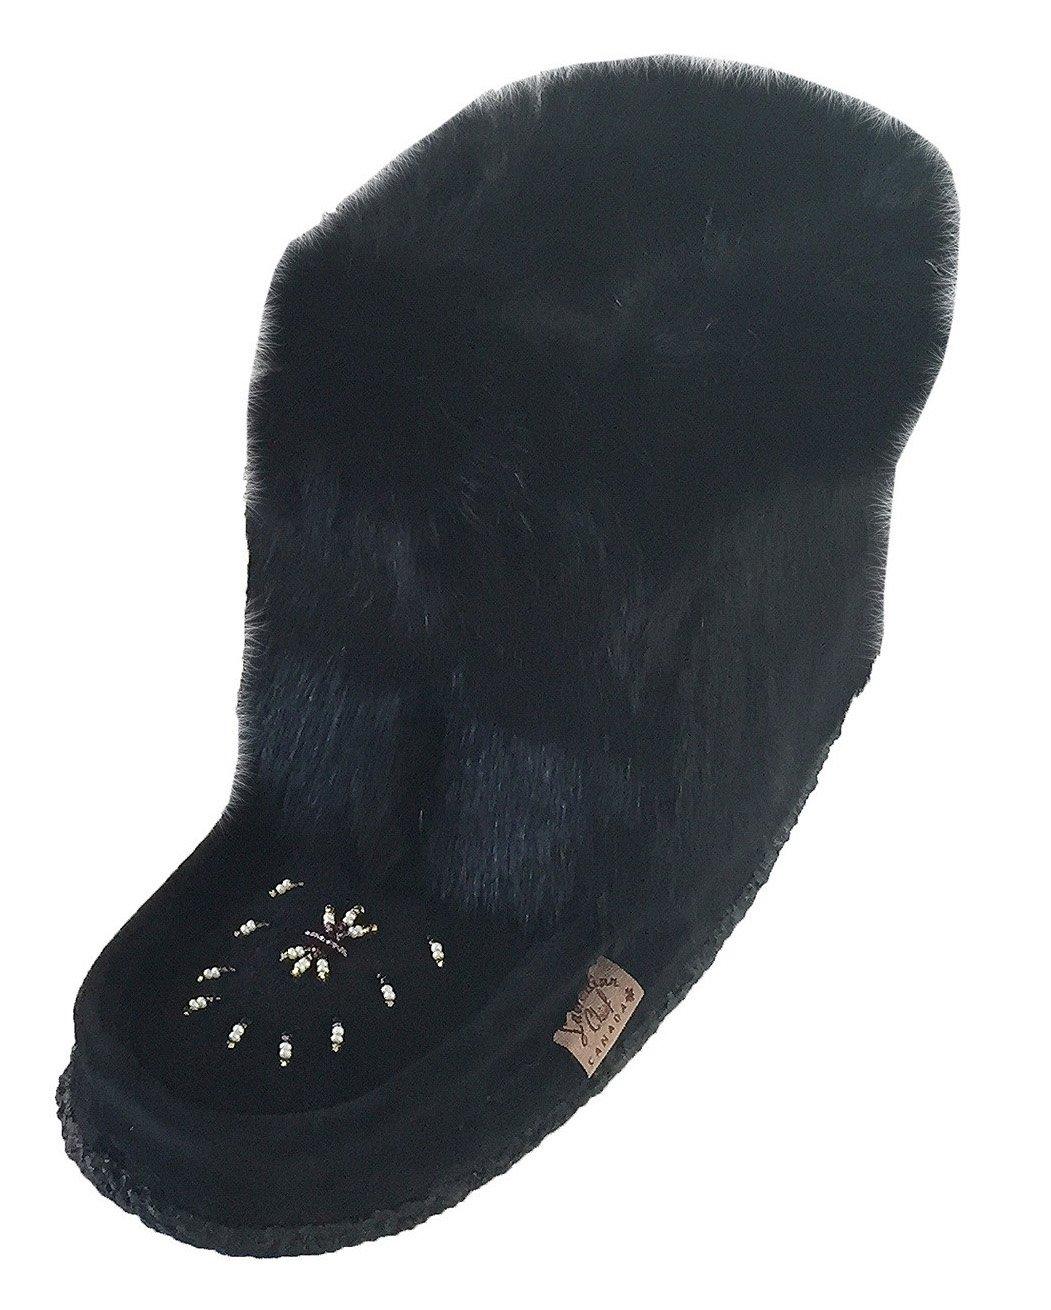 Laurentian Chief Tsar Short Black Rabbit Fur Beaded Suede Mukluks (10)